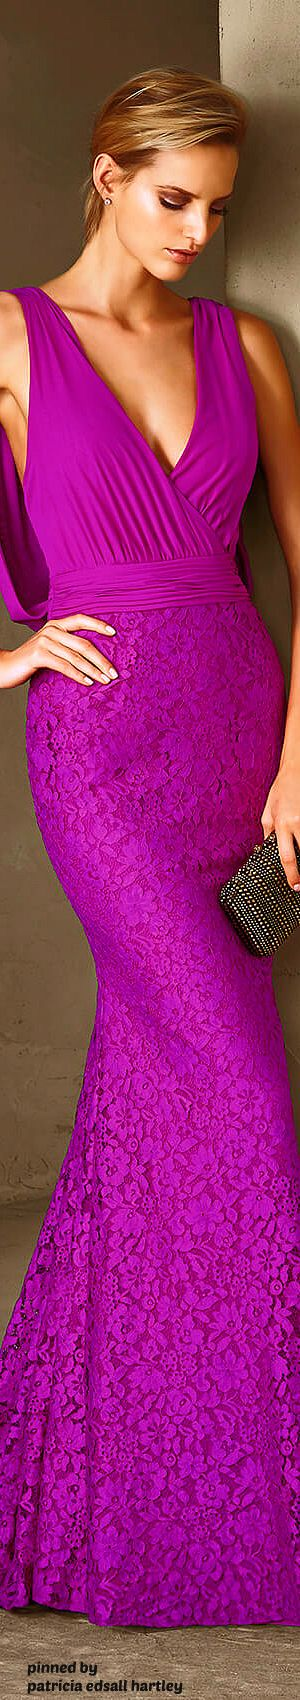 Mejores 25 imágenes de ropa en Pinterest | Ropa informal, Alta ...